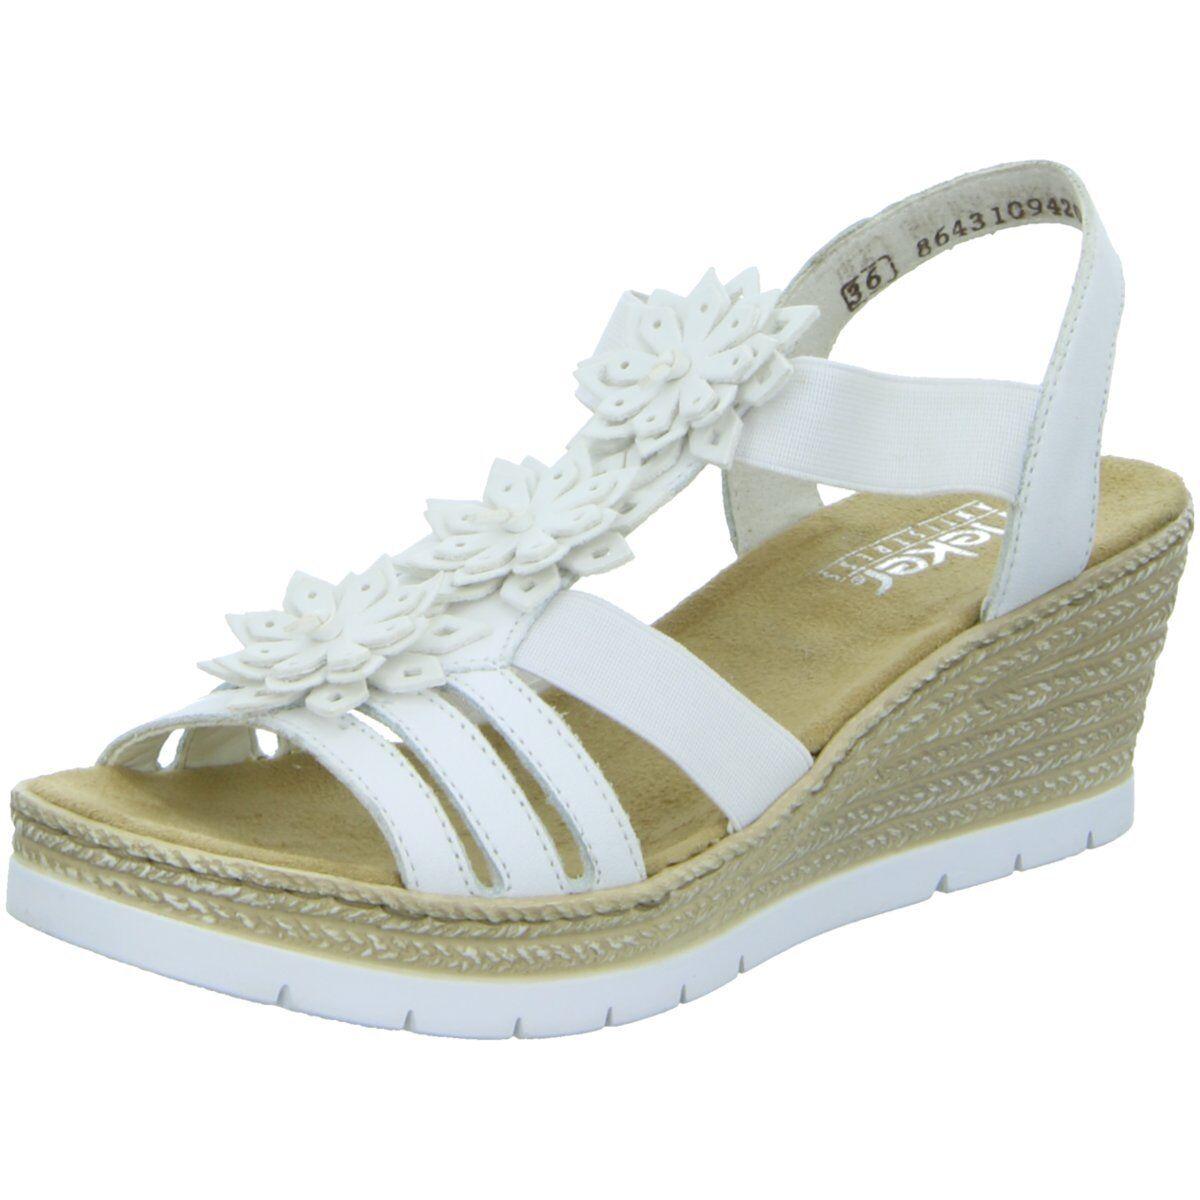 NEU Rieker Damen Sandaleetten Sandaleette eleganter Boden 61949-80 weiß 244403